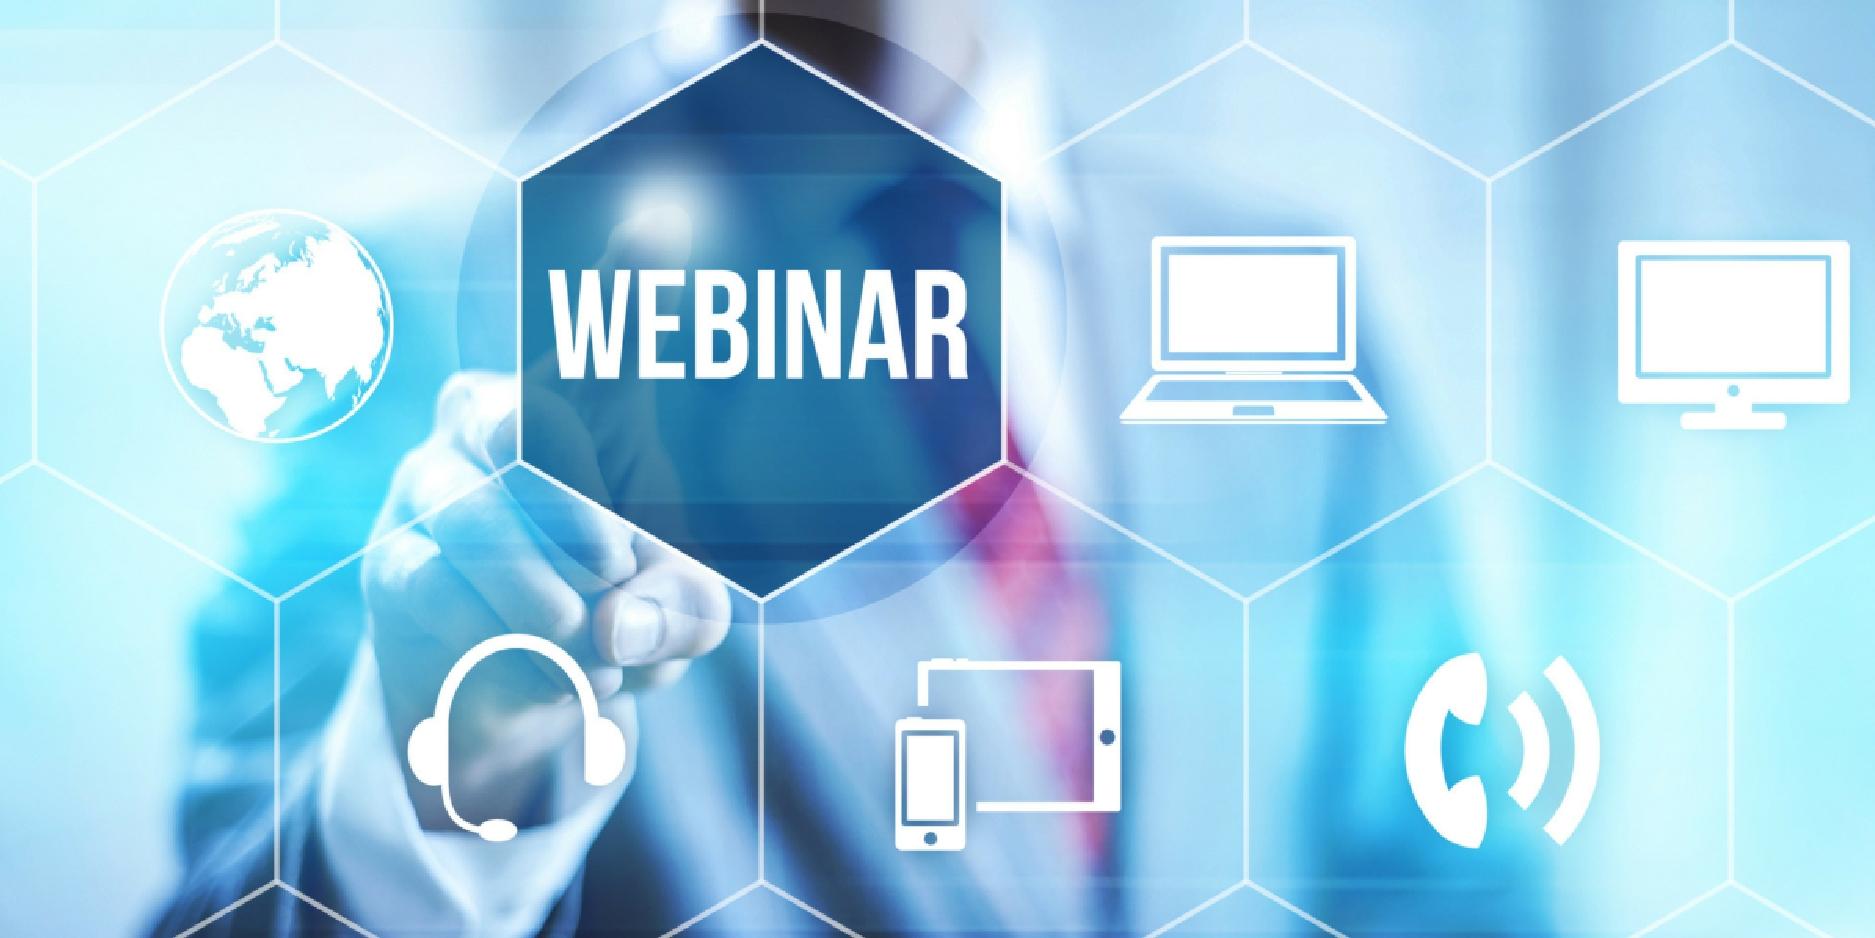 Webinar Producers Shares How and Why to Do a Webinar